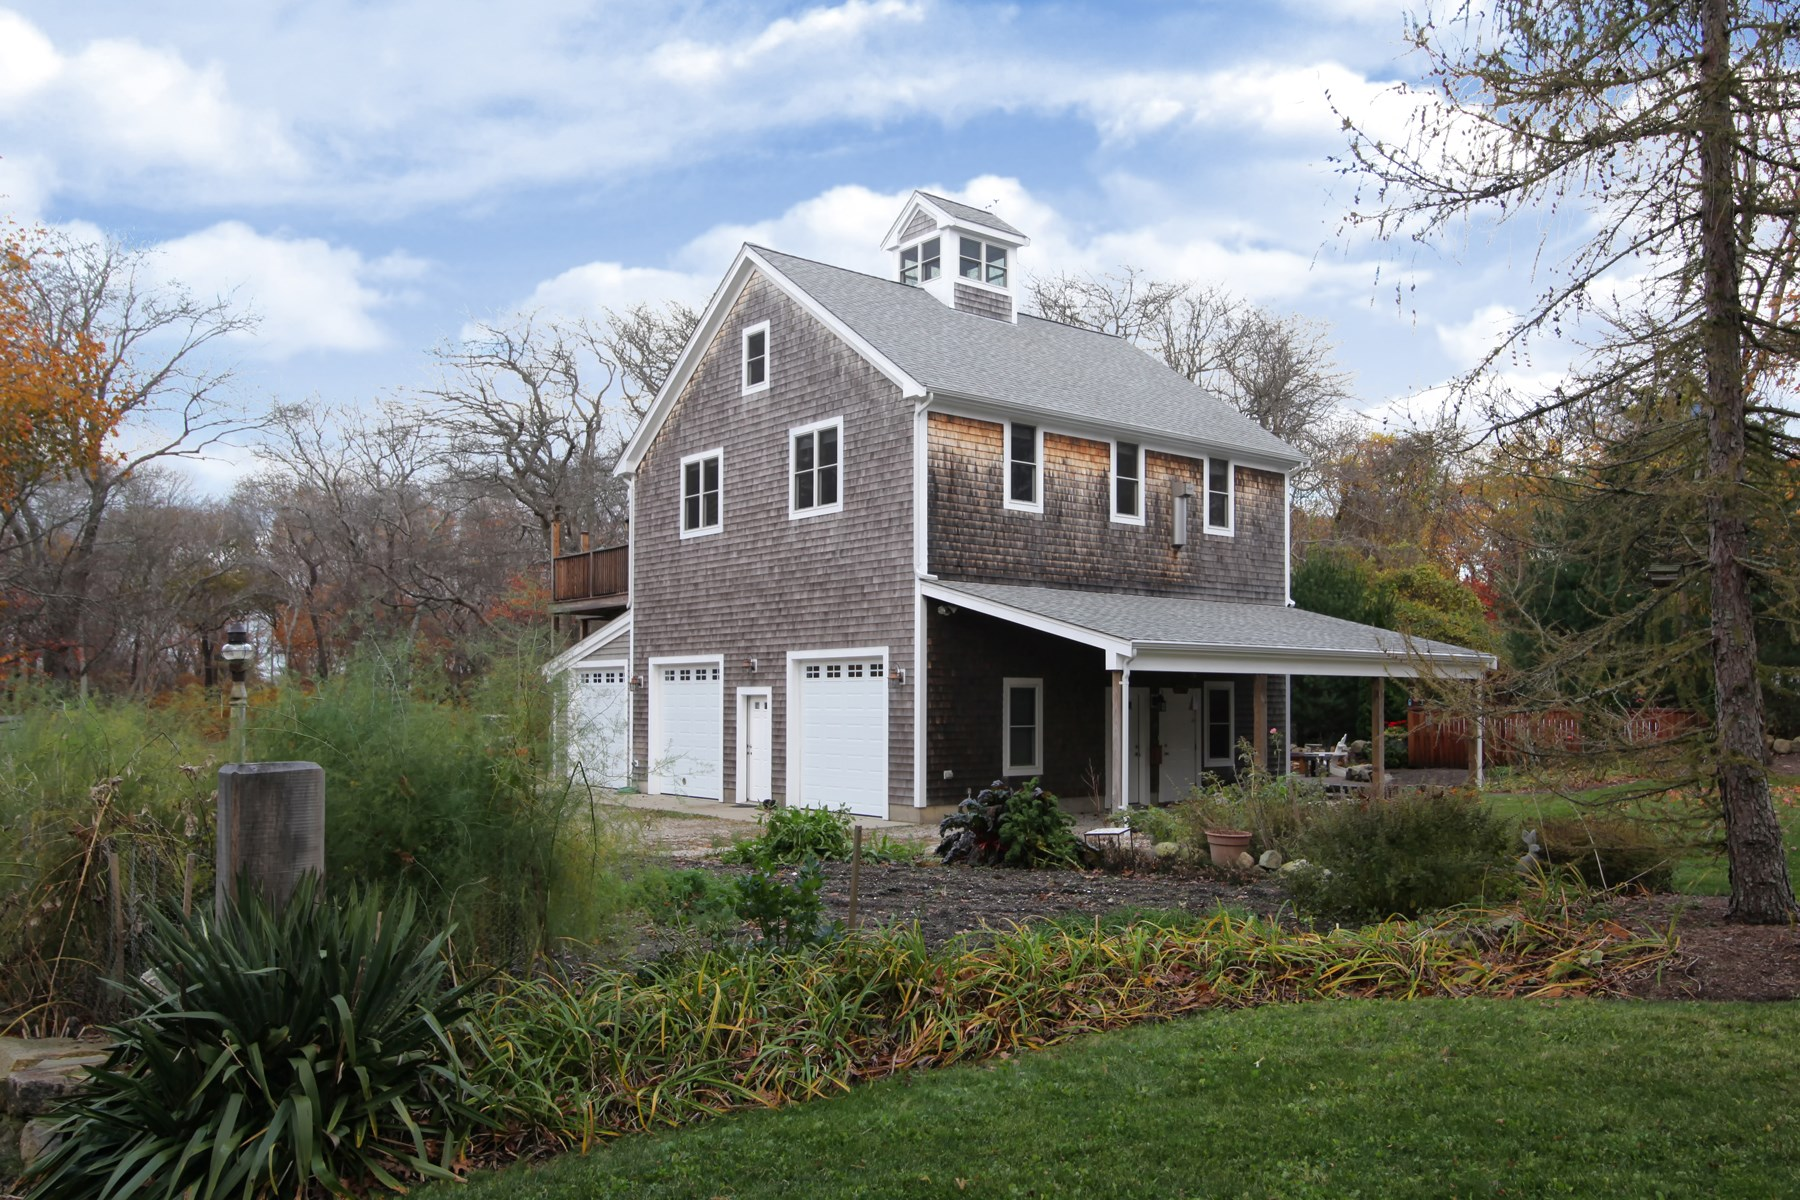 Condominium for Sale at Spacious Contemporary Barn 13 Tupper Road Unit B Sandwich, Massachusetts 02563 United States